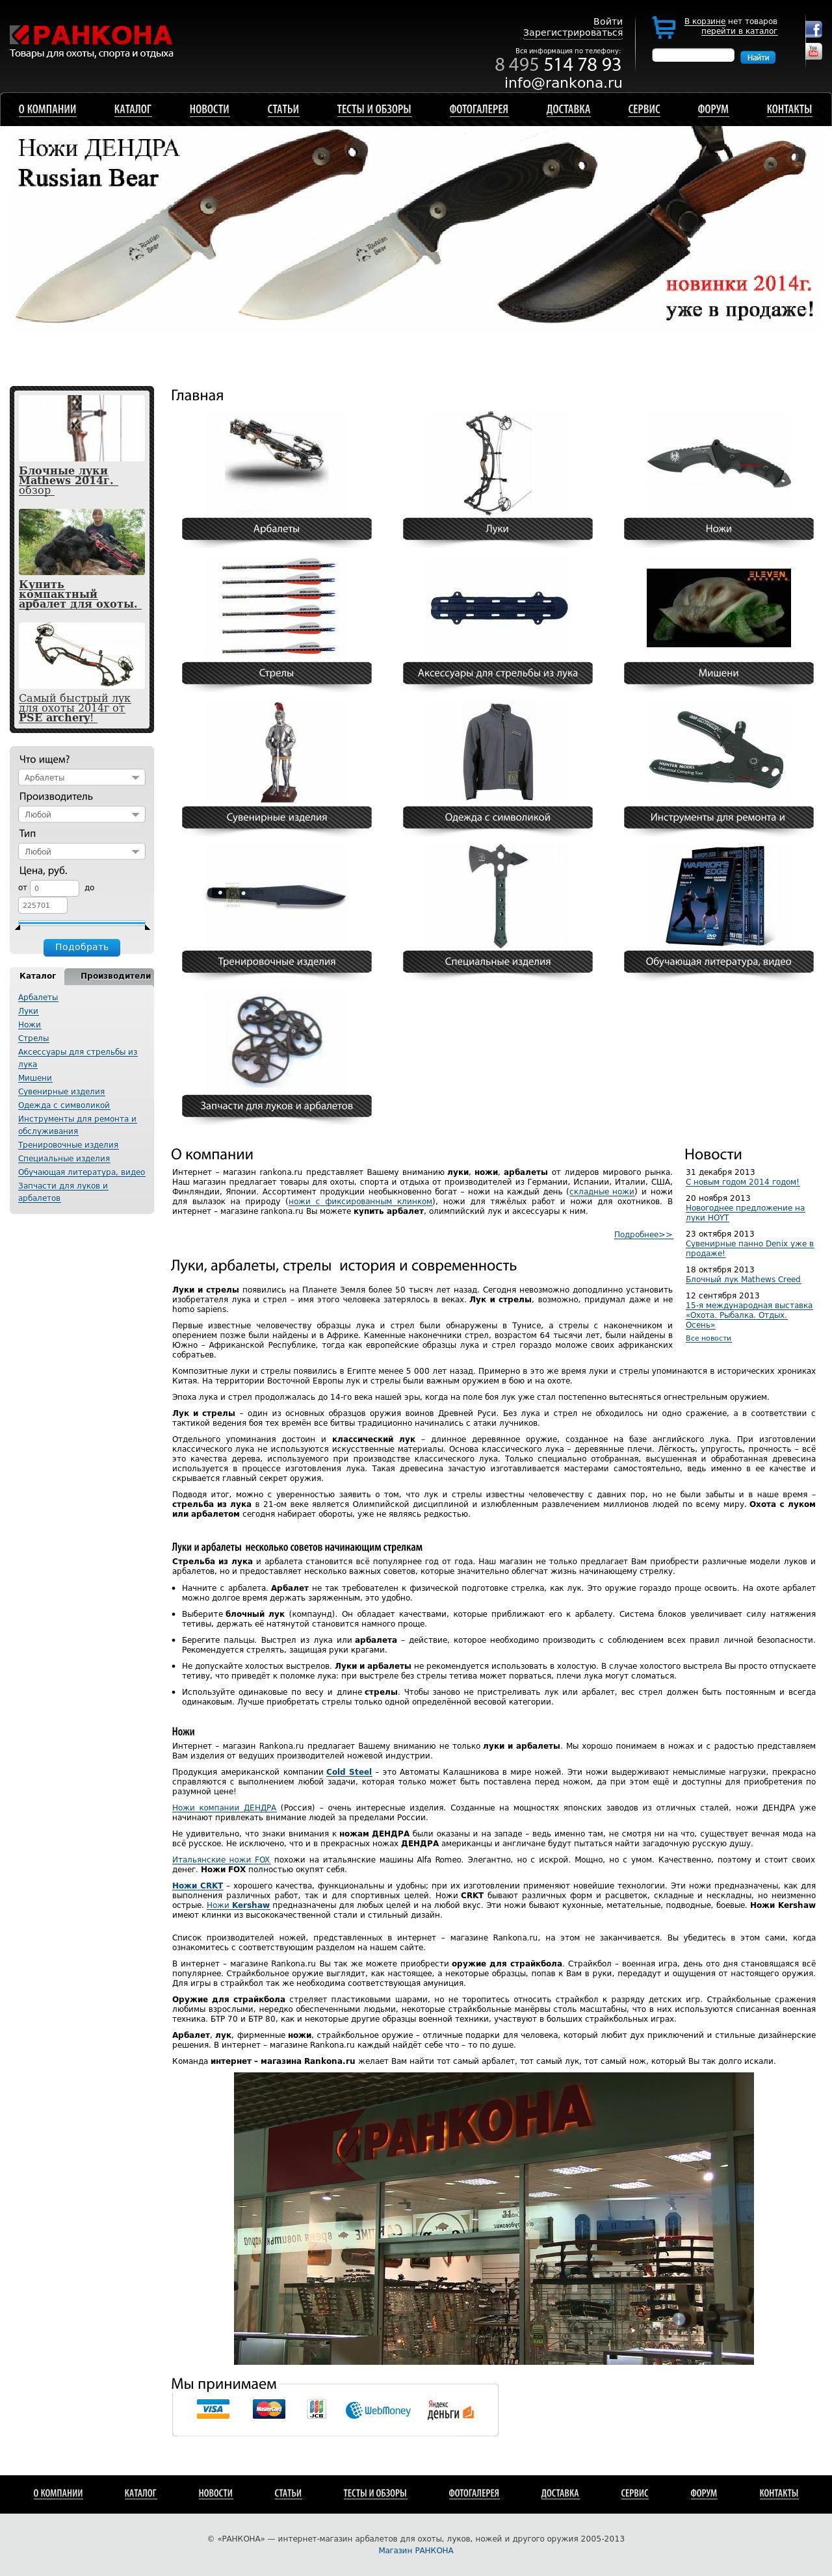 Рефакторинг интернет магазина компании «РАНКОНА» (Битрикс Малый бизнес)